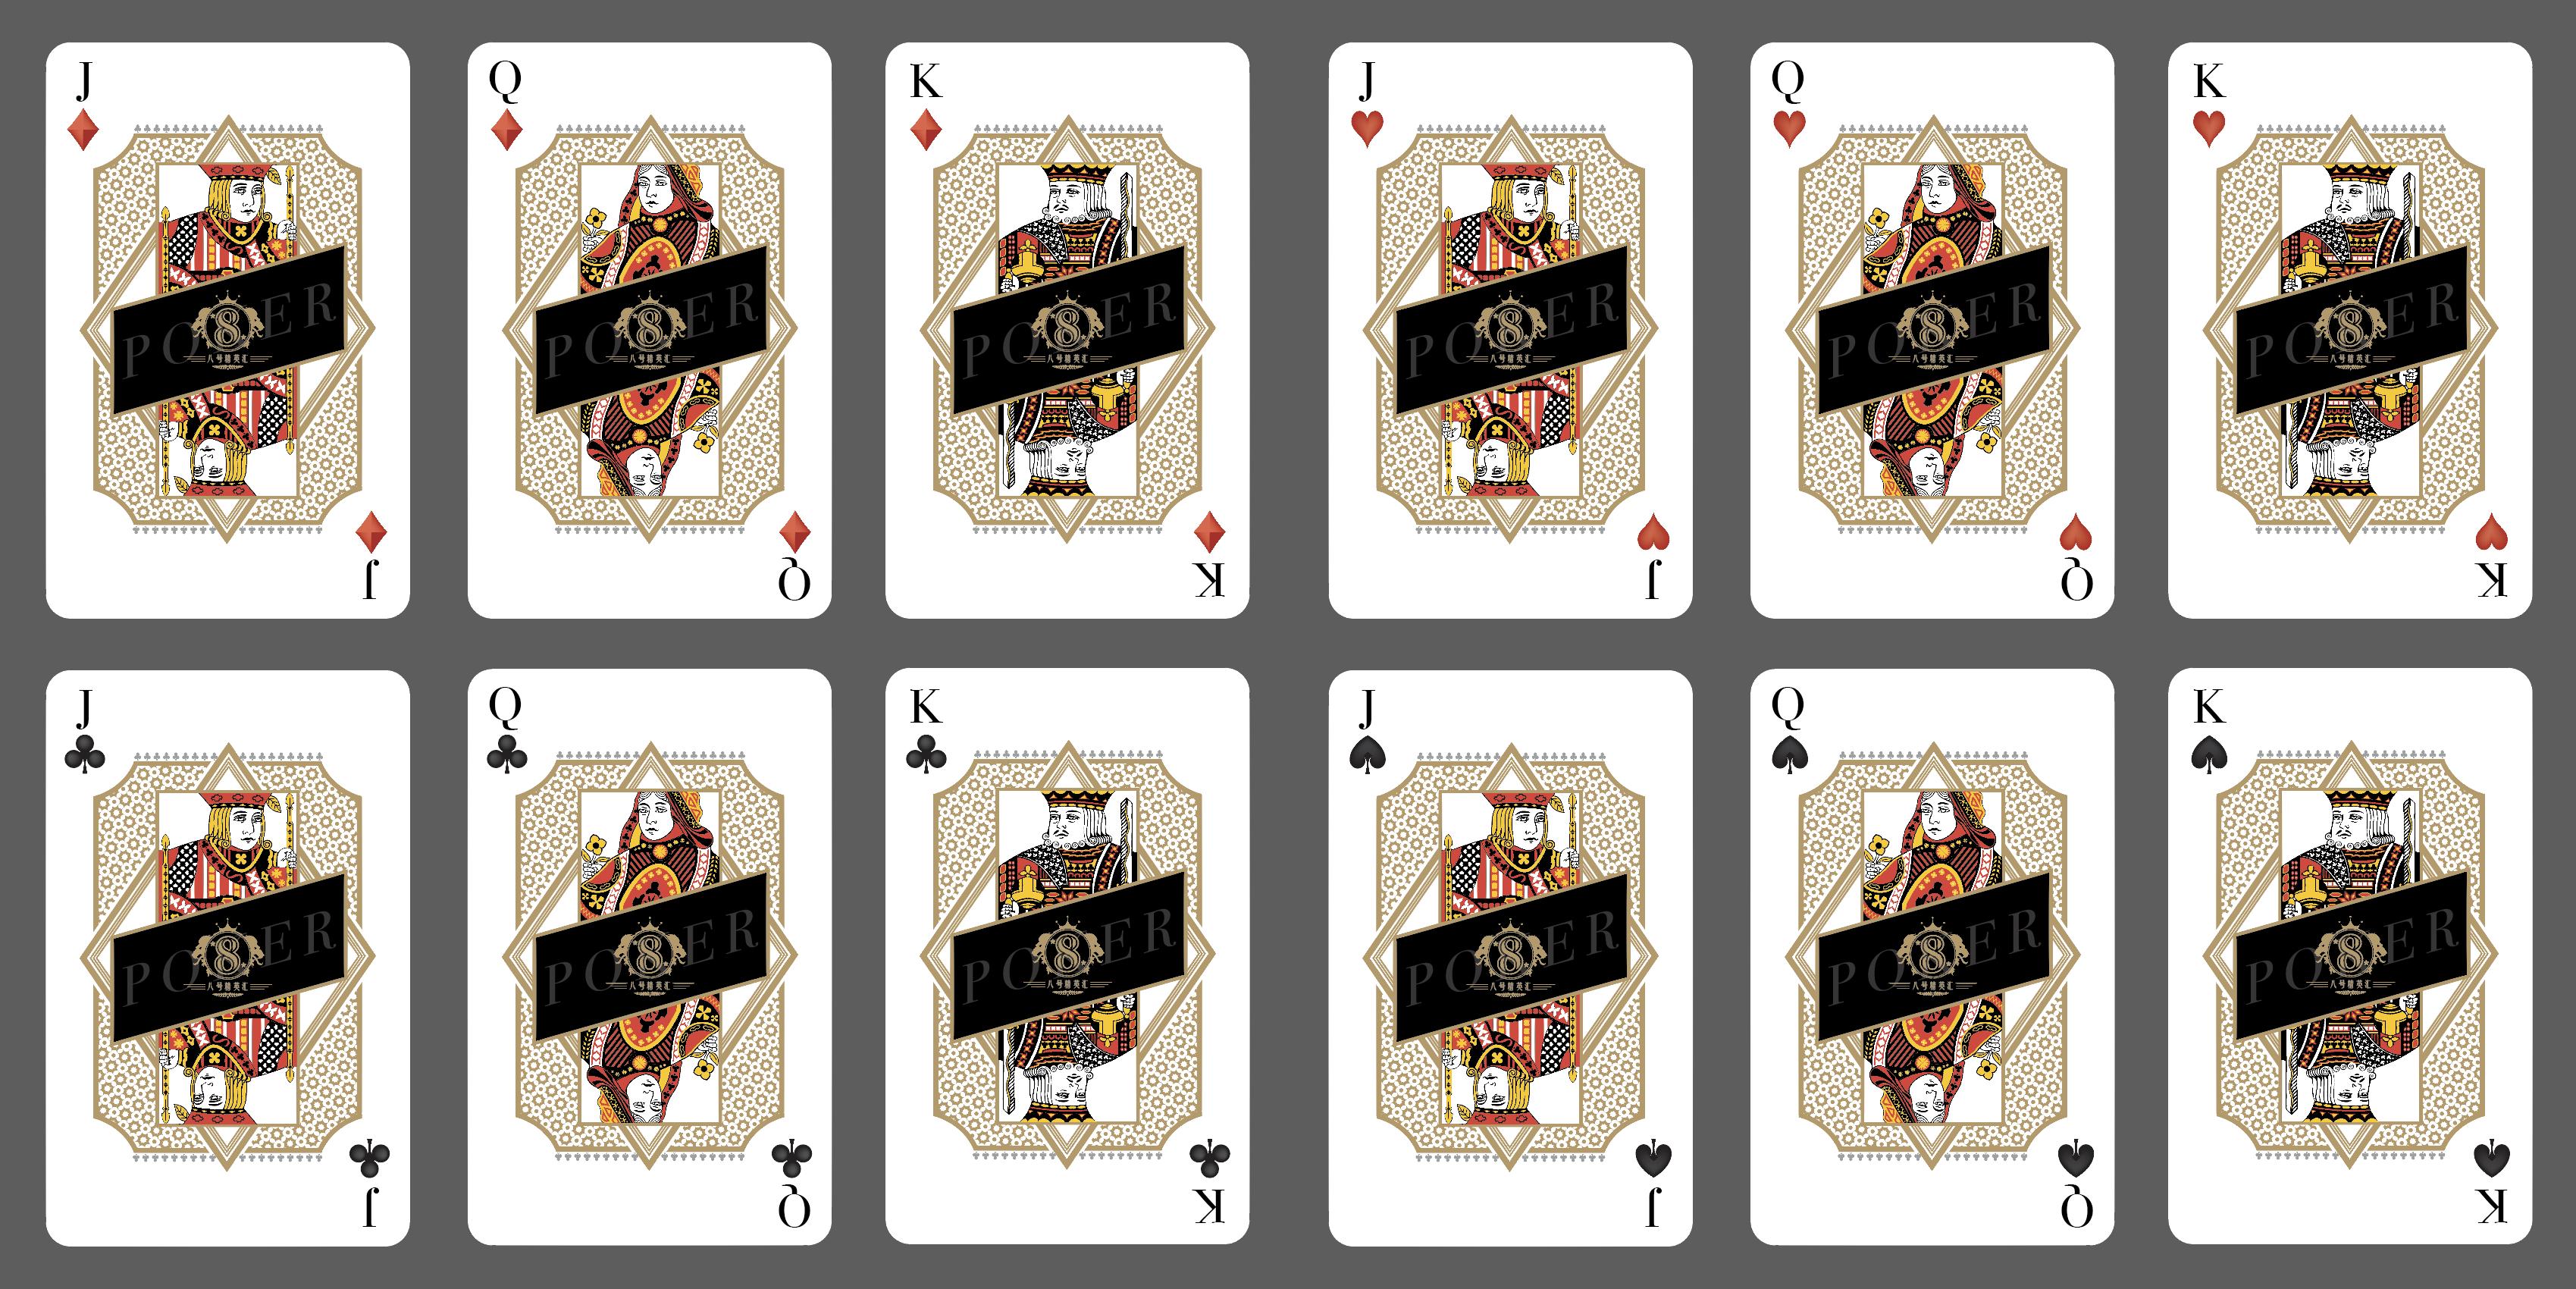 8club poker h5设计-app界面-ui-sunny8915 - 原创